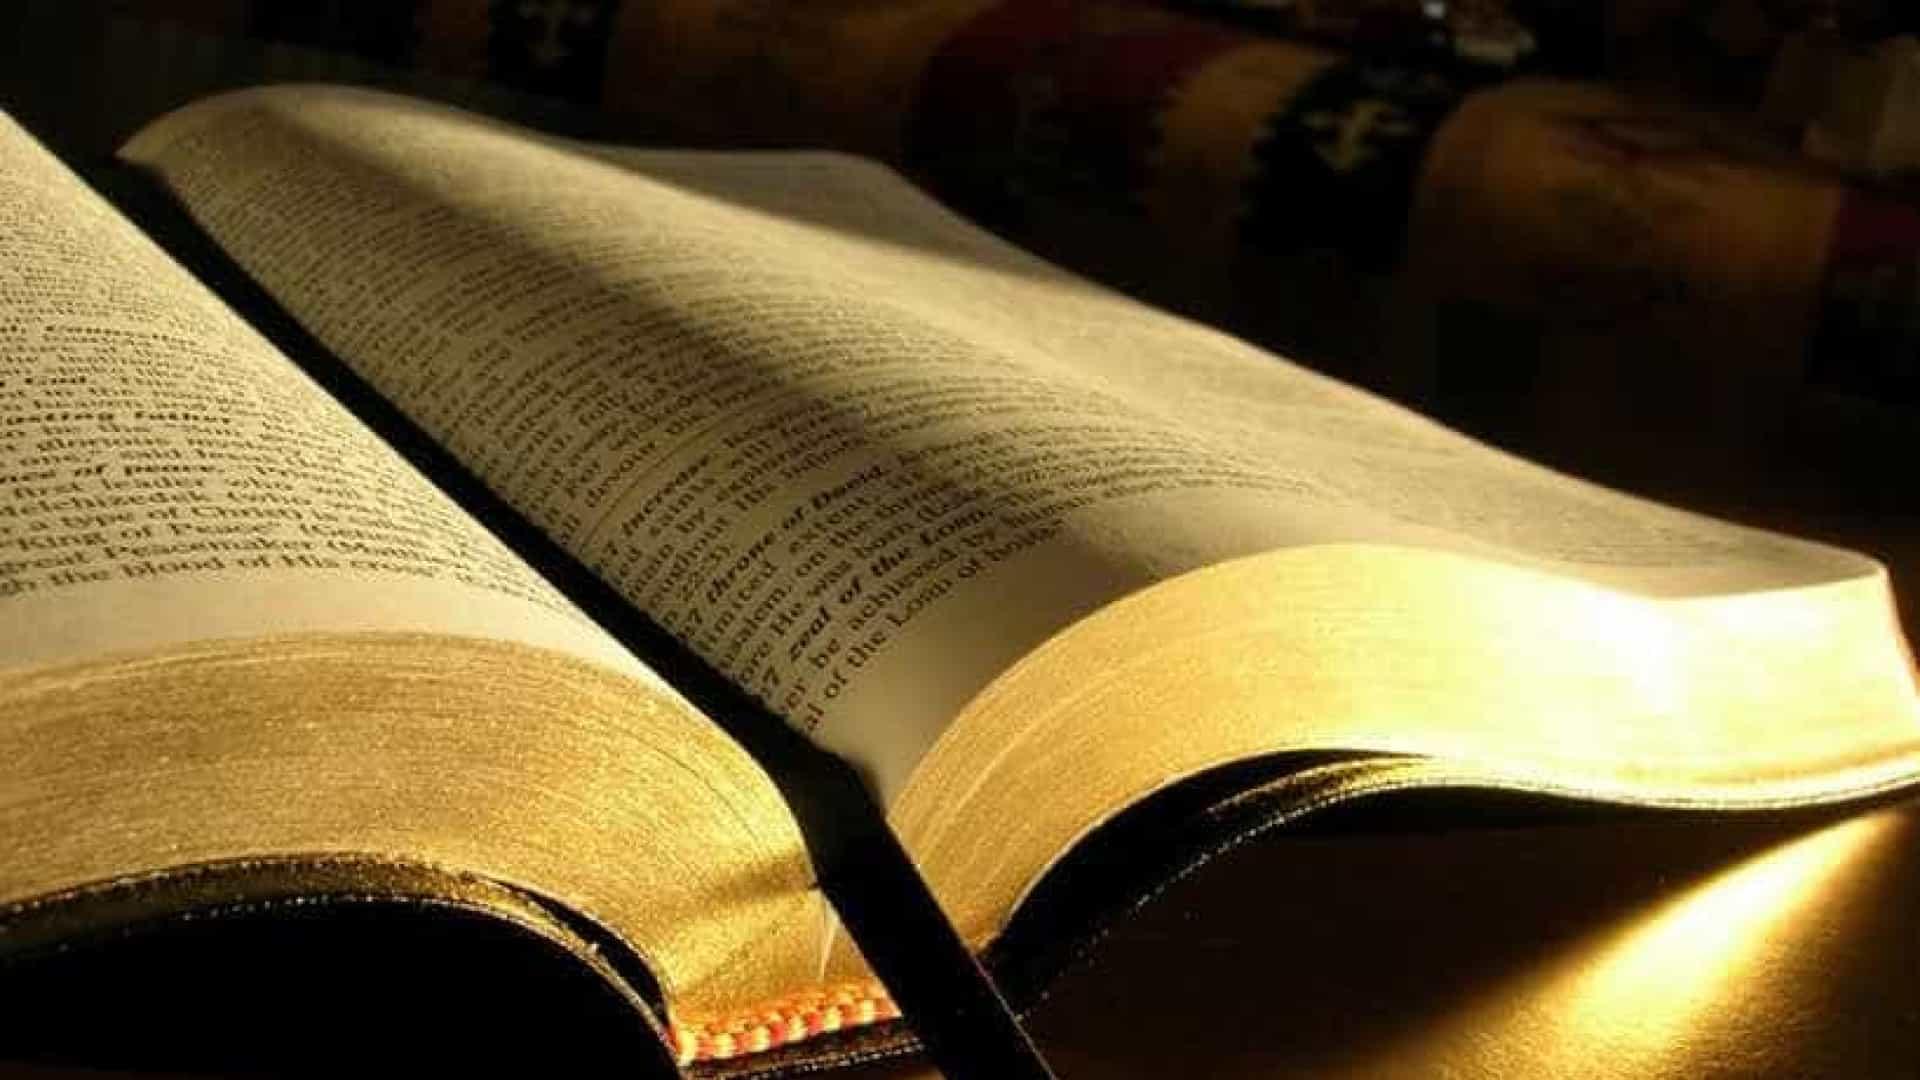 Biblia%2bsite